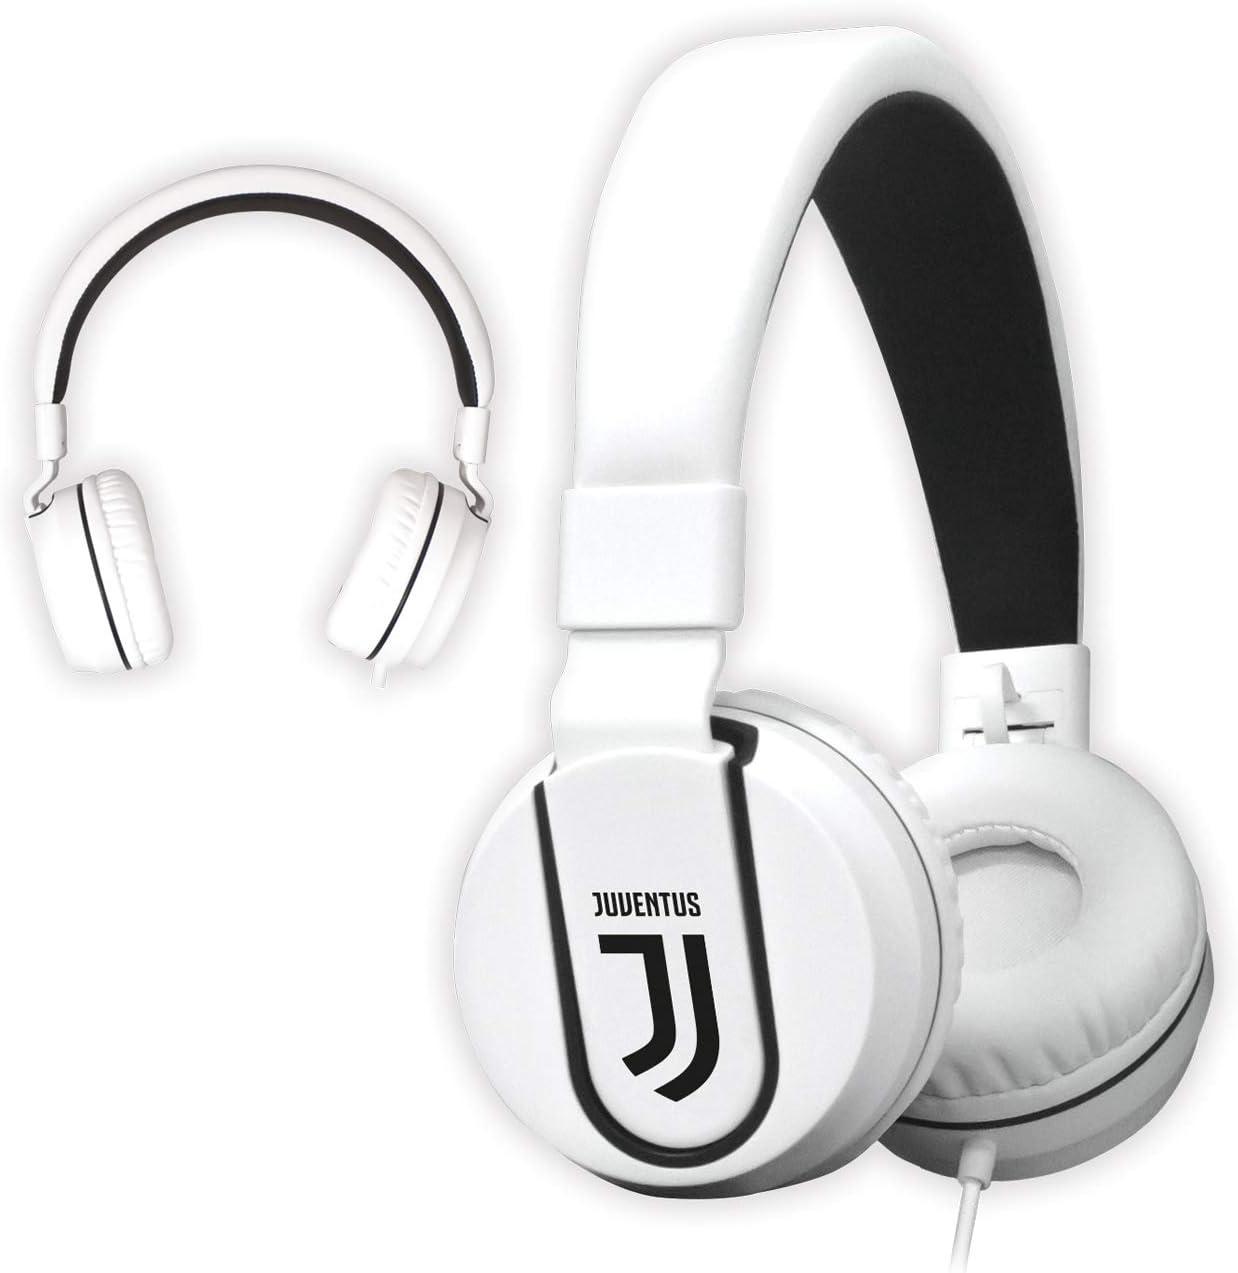 Juventus cuffie